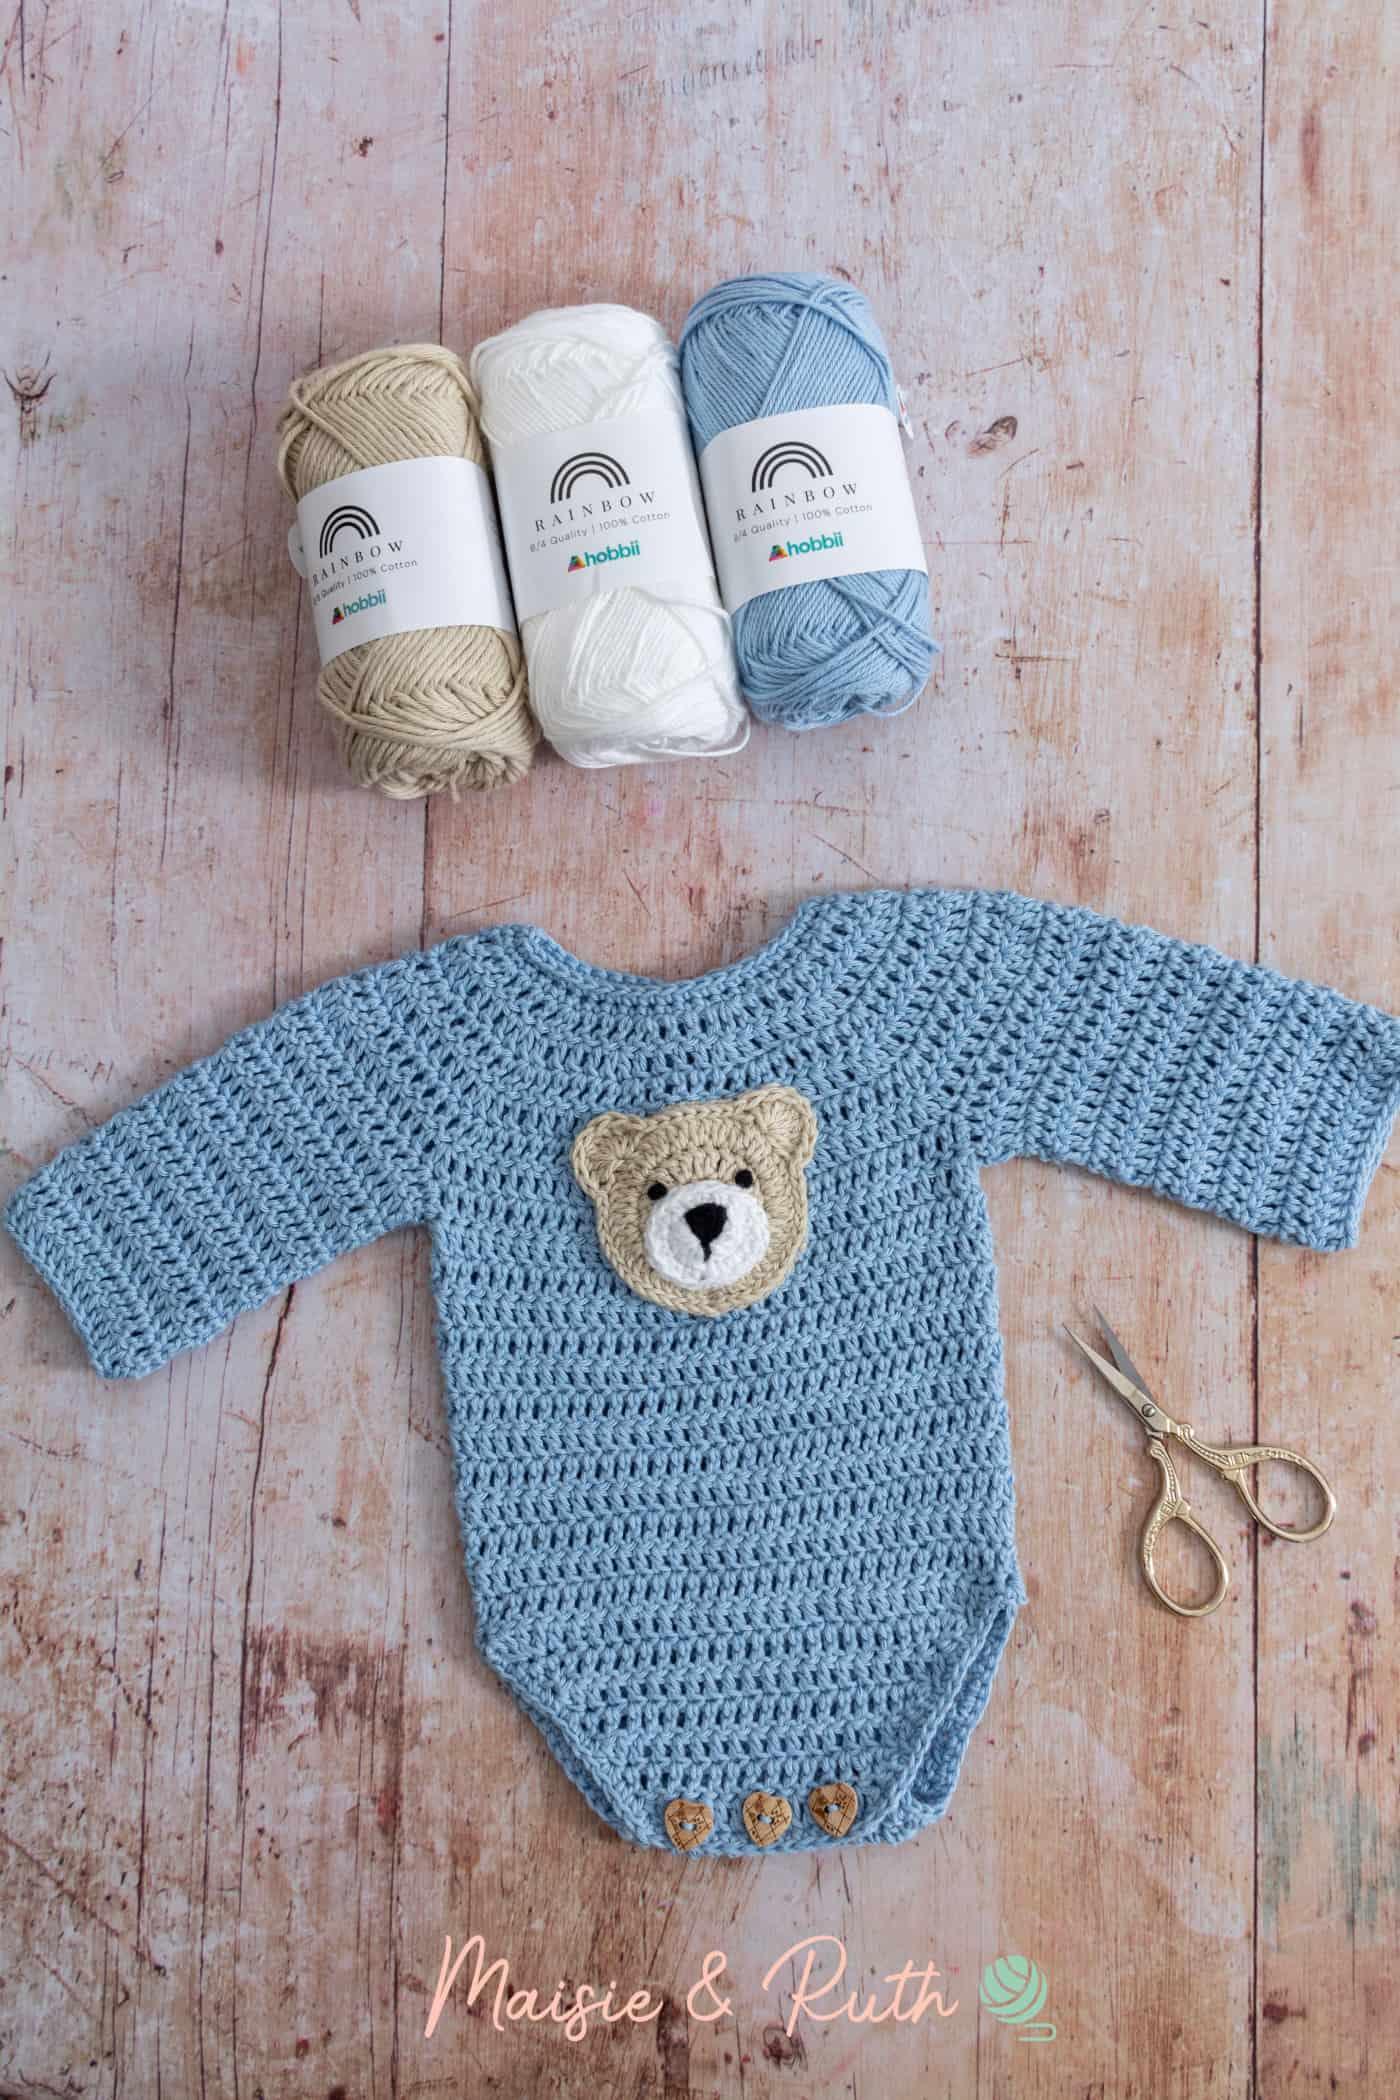 Crochet Baby Onesie Pattern Yarn Used